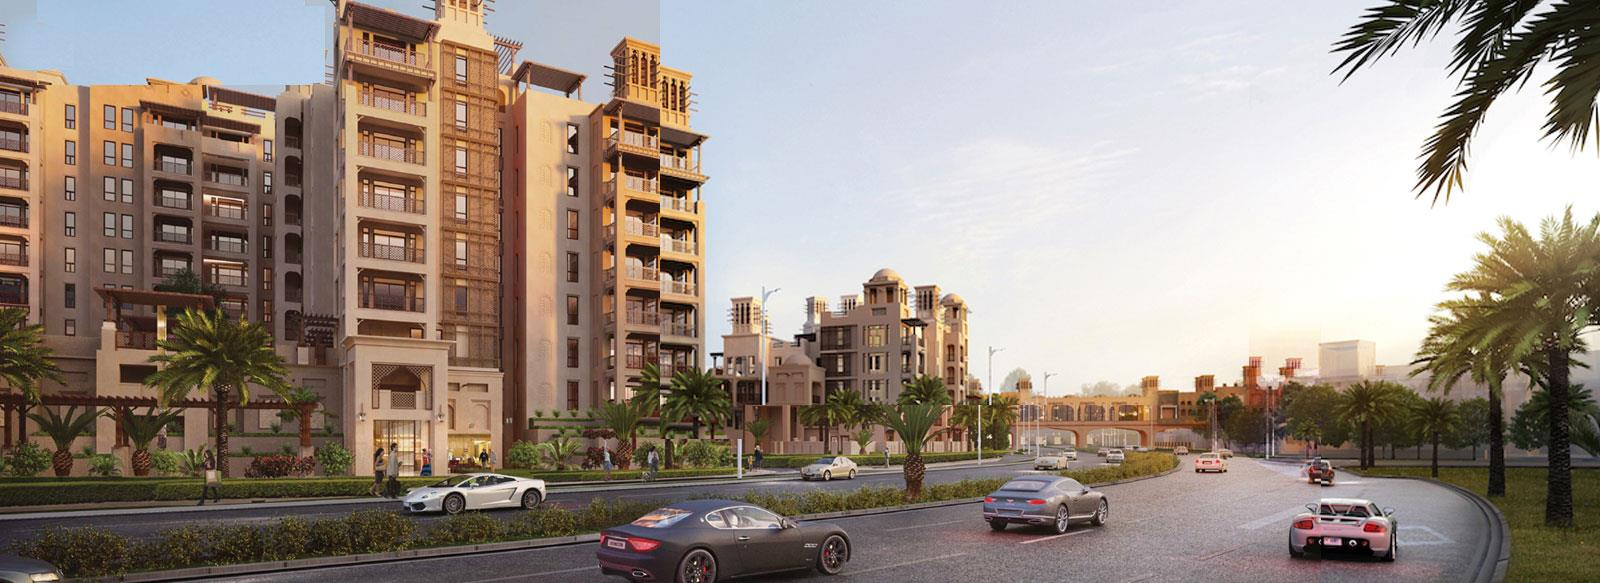 <div>Luxury 1, 2, 3 &amp; 4 BR Apartments,</div><div><br></div><div>Starting From AED 1.16 Million</div>